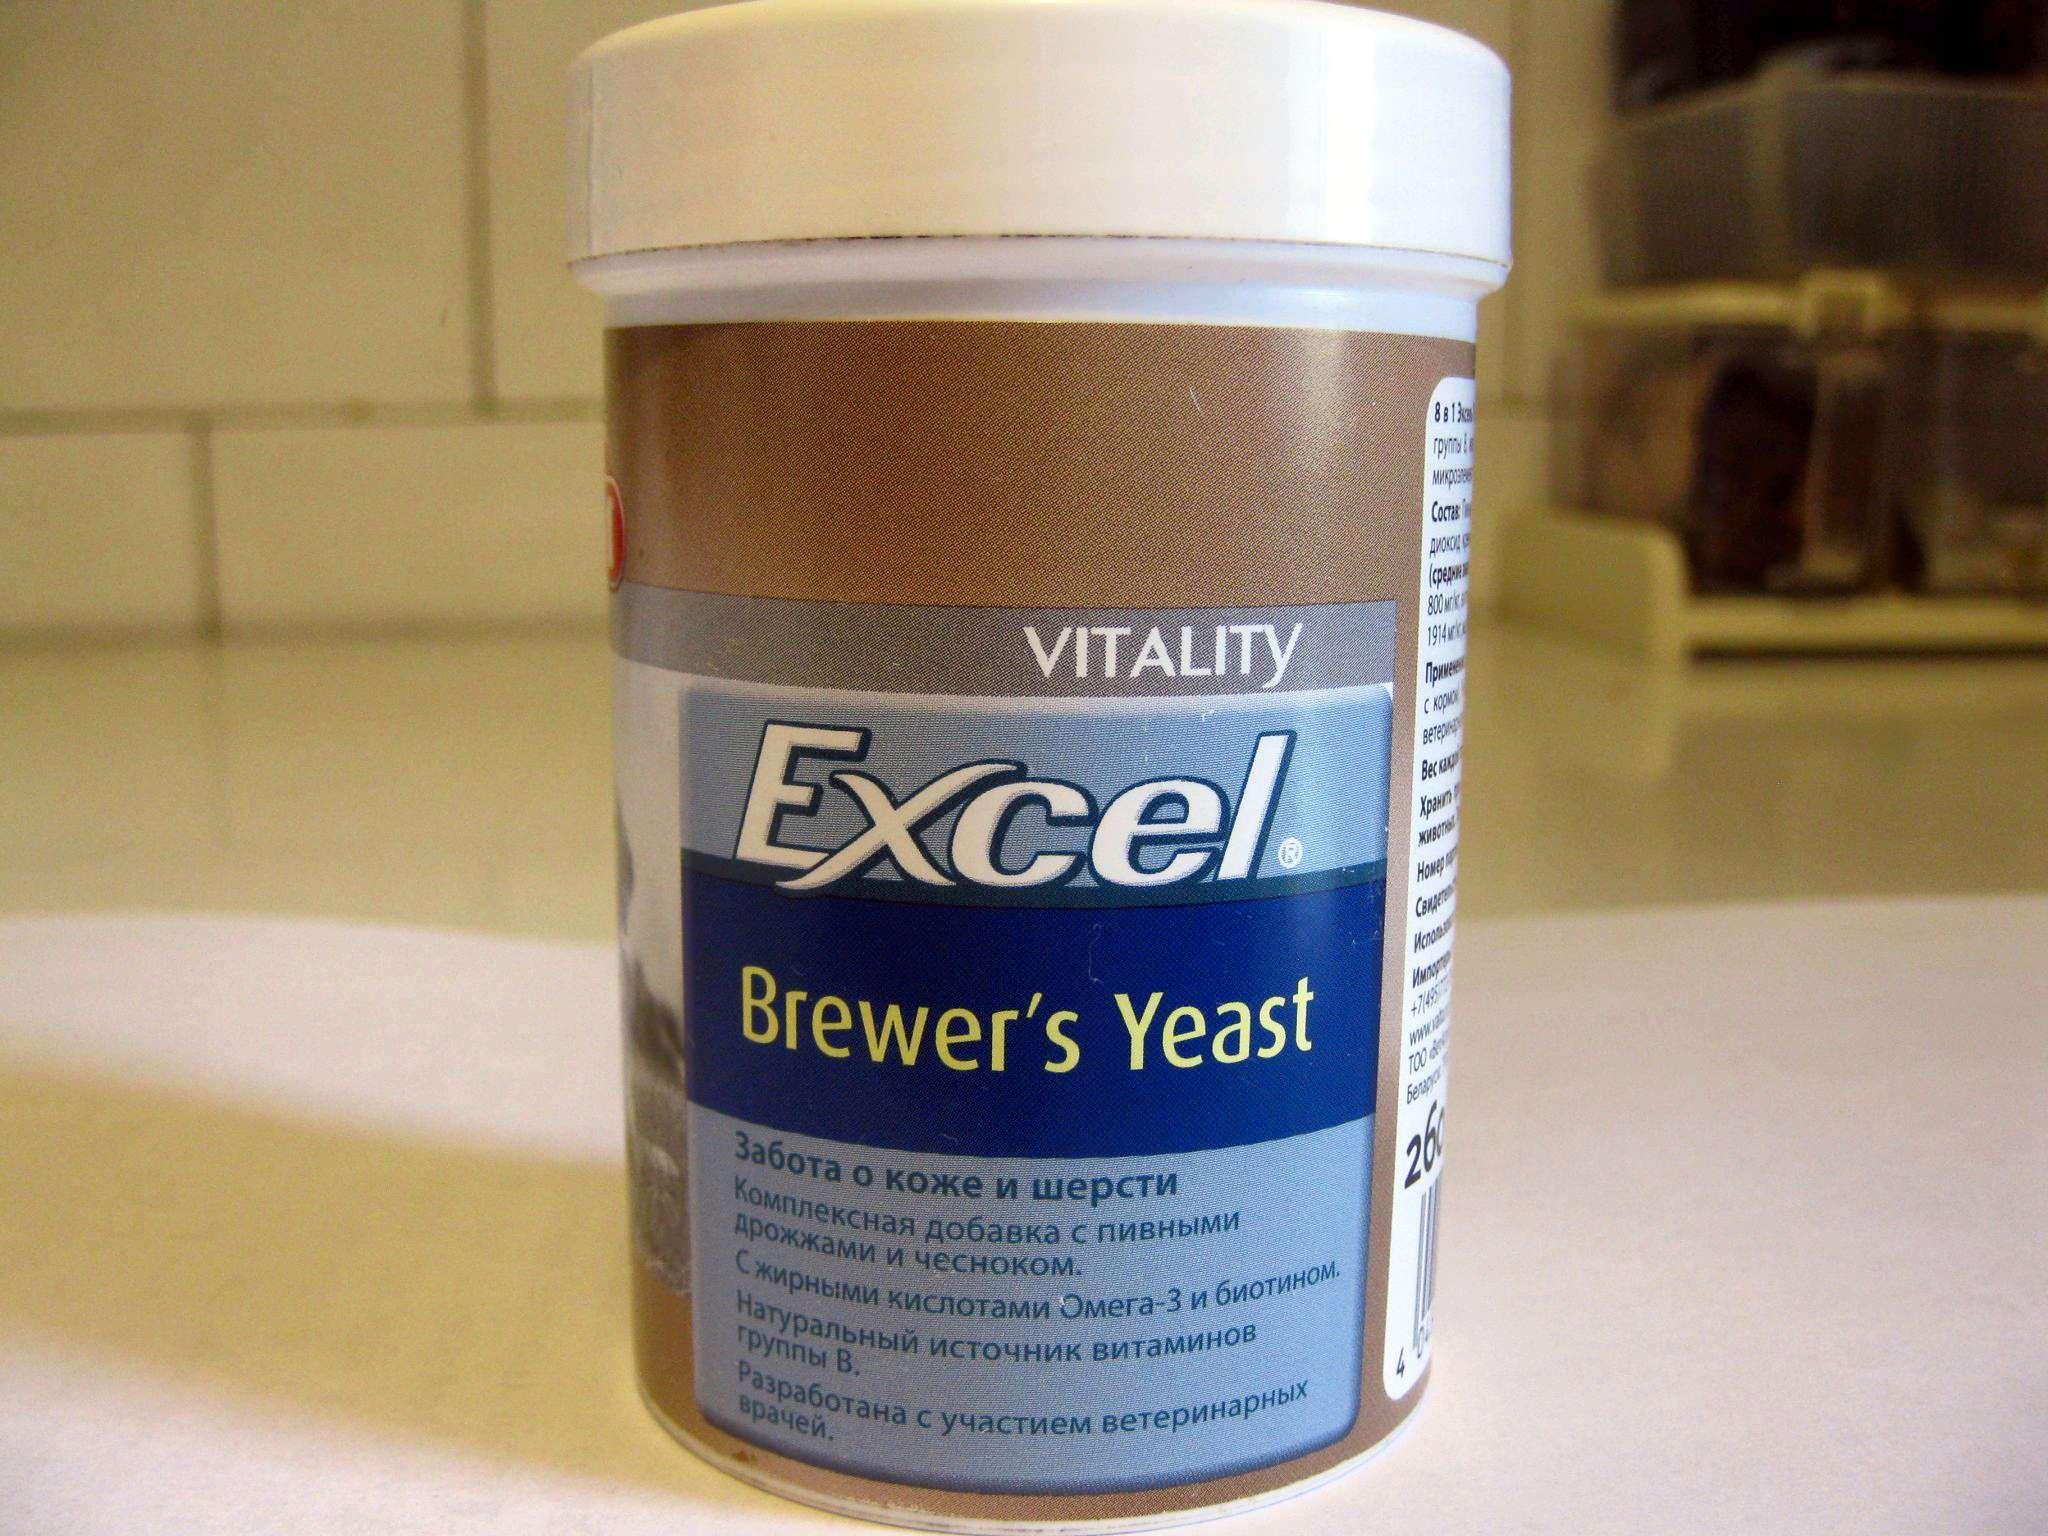 витамины для крупных собак 8 in 1 Excel Brewer's Yeast